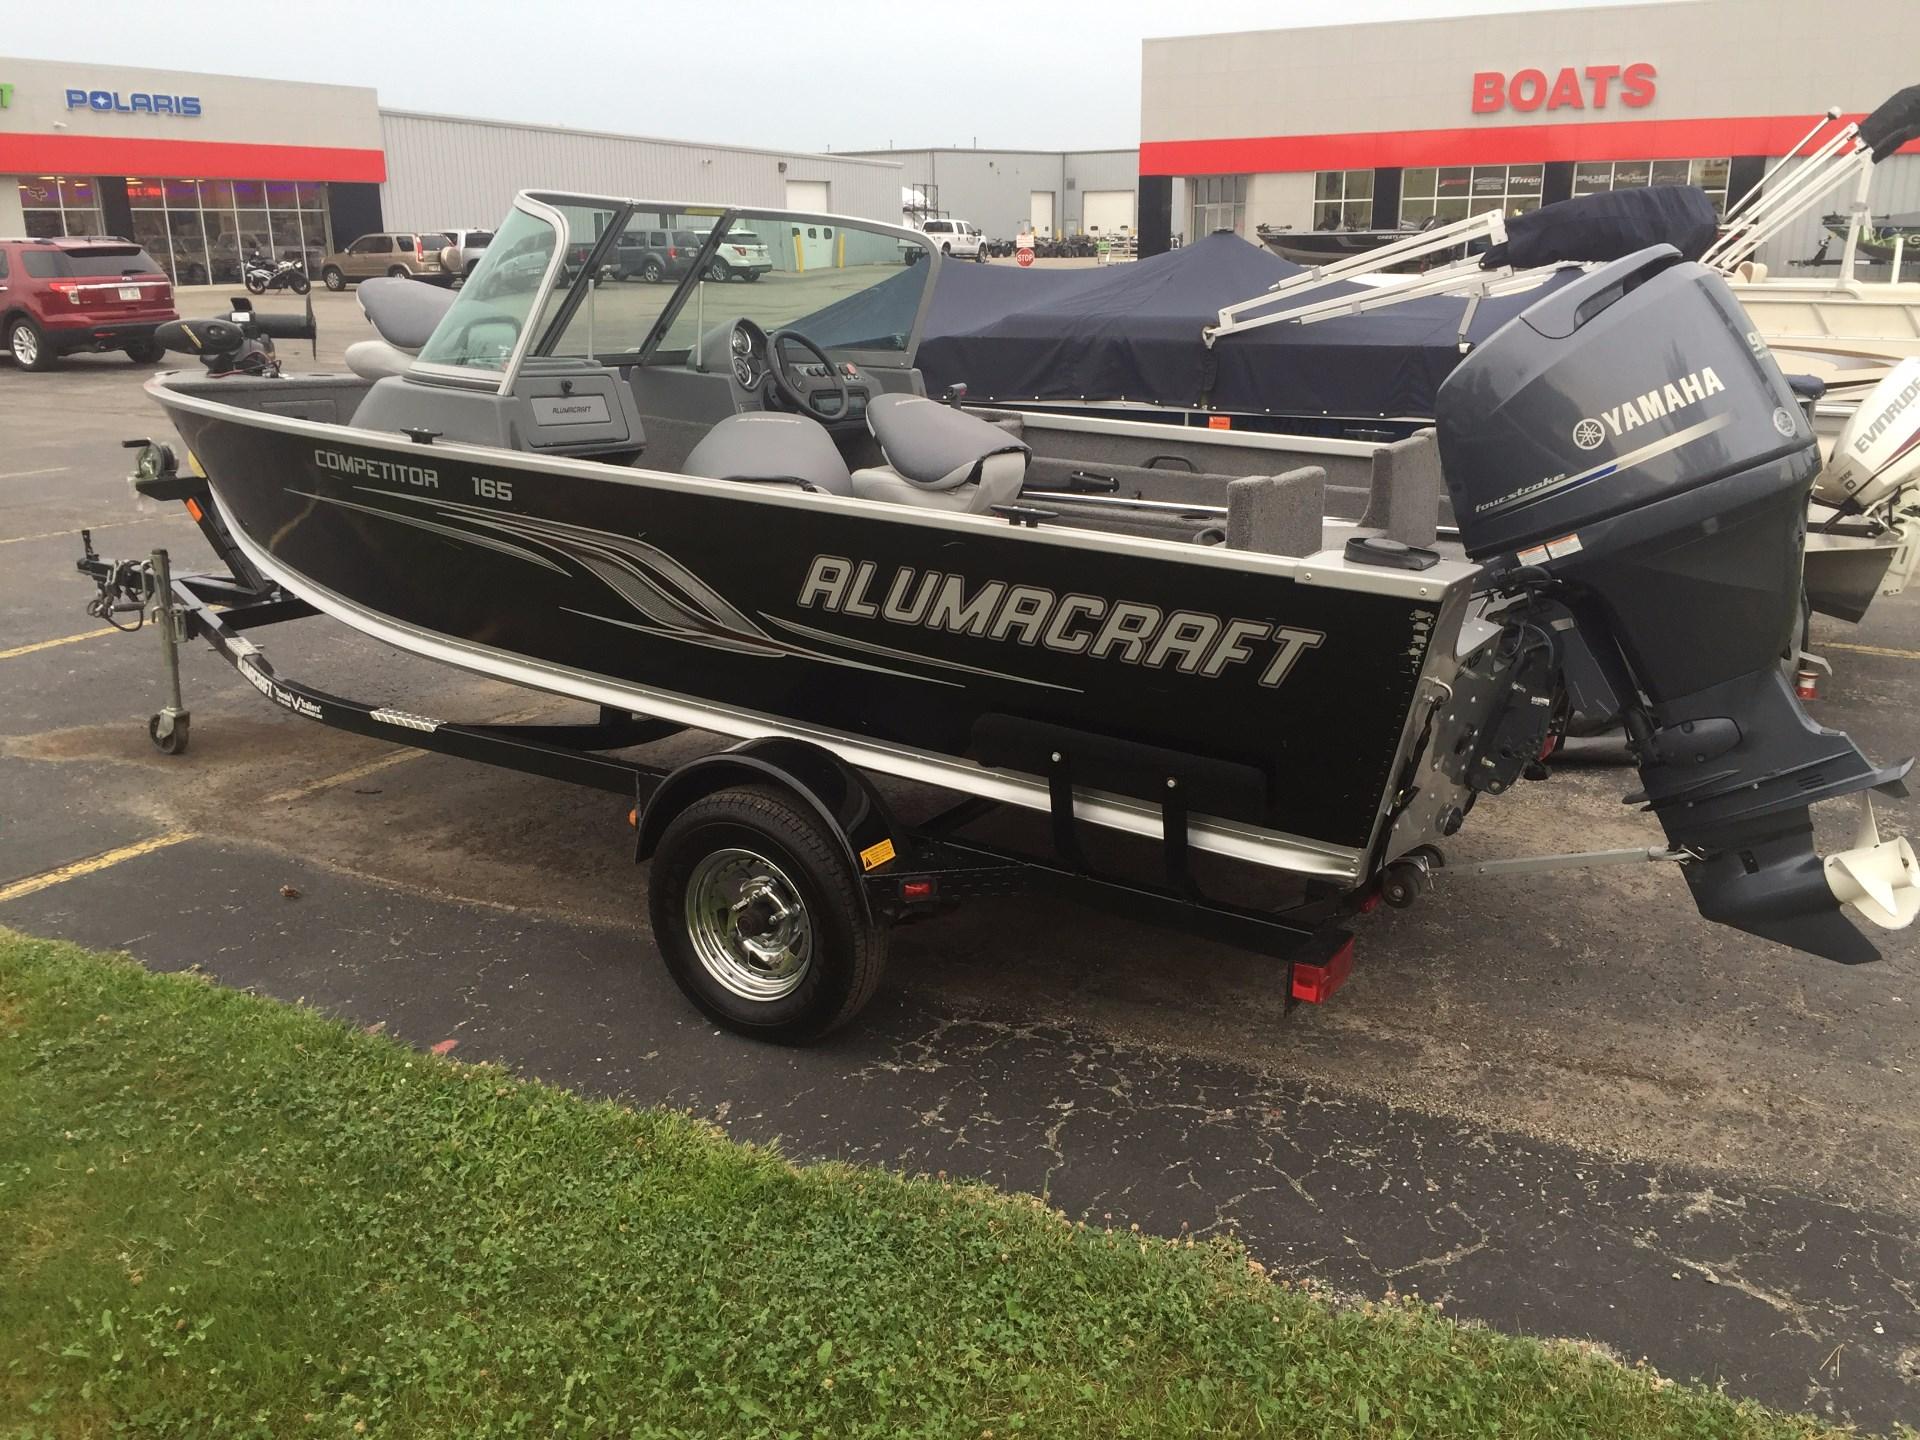 Used alumacraft boats for sale in wisconsin united states for Used fishing boats for sale in wisconsin